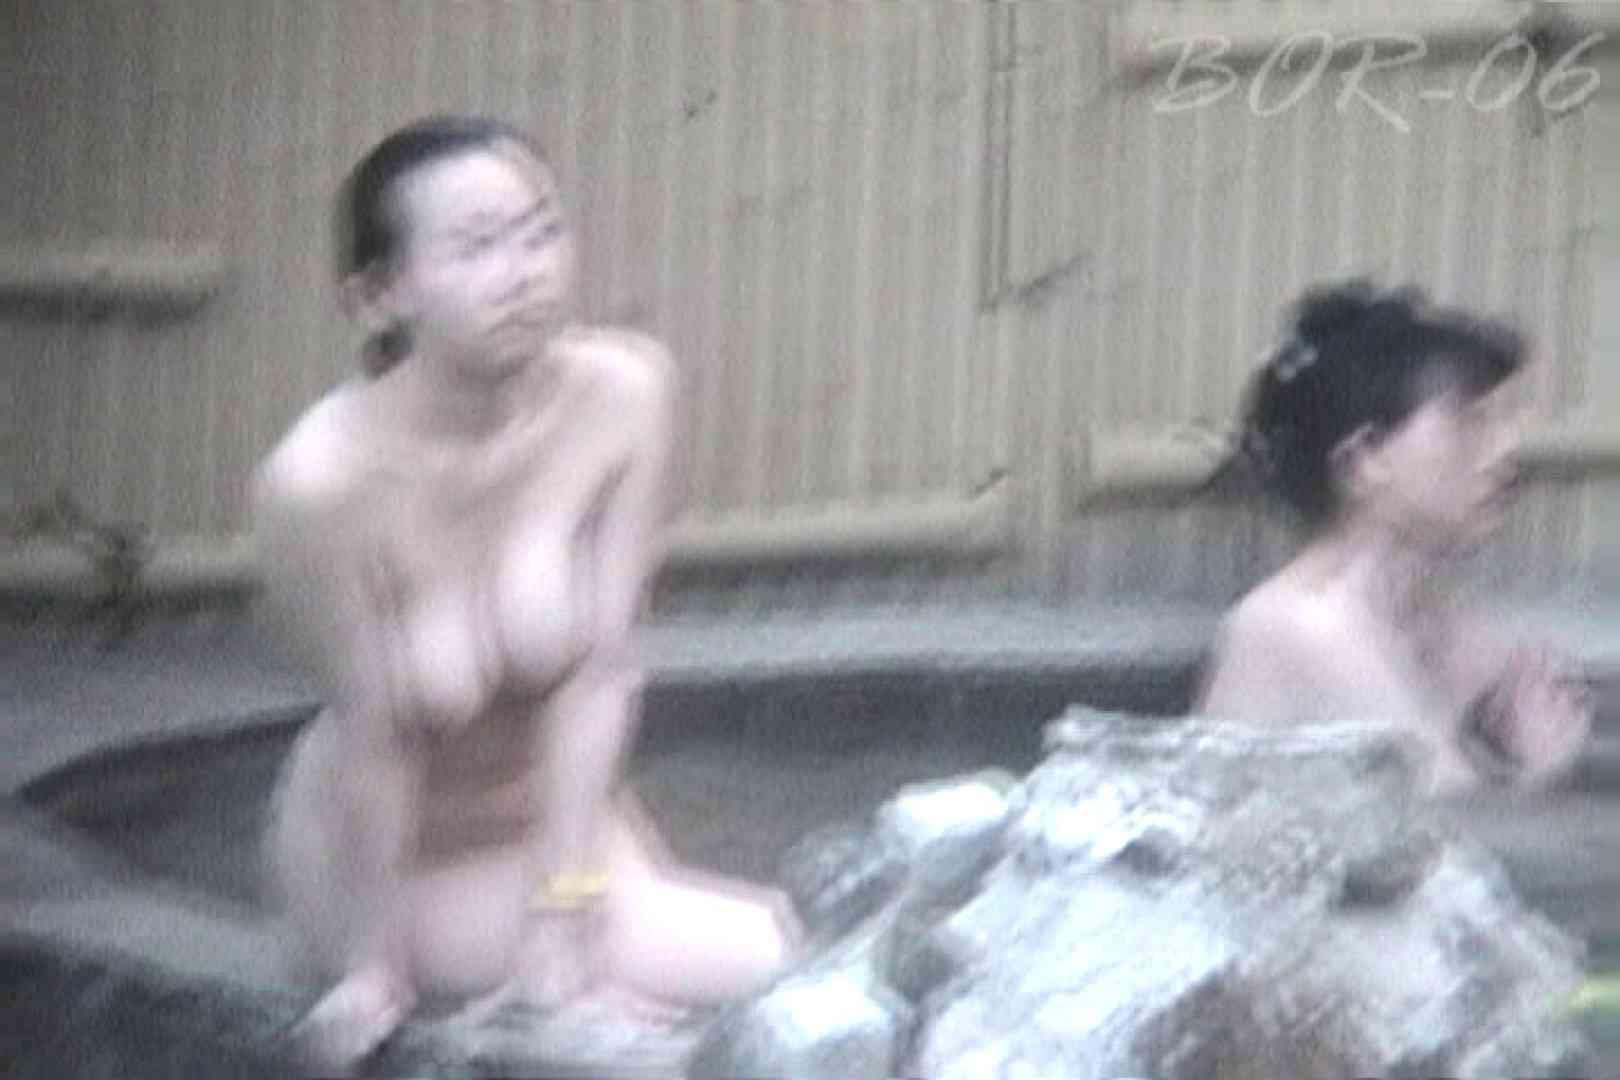 Aquaな露天風呂Vol.519 盗撮師作品  102pic 33